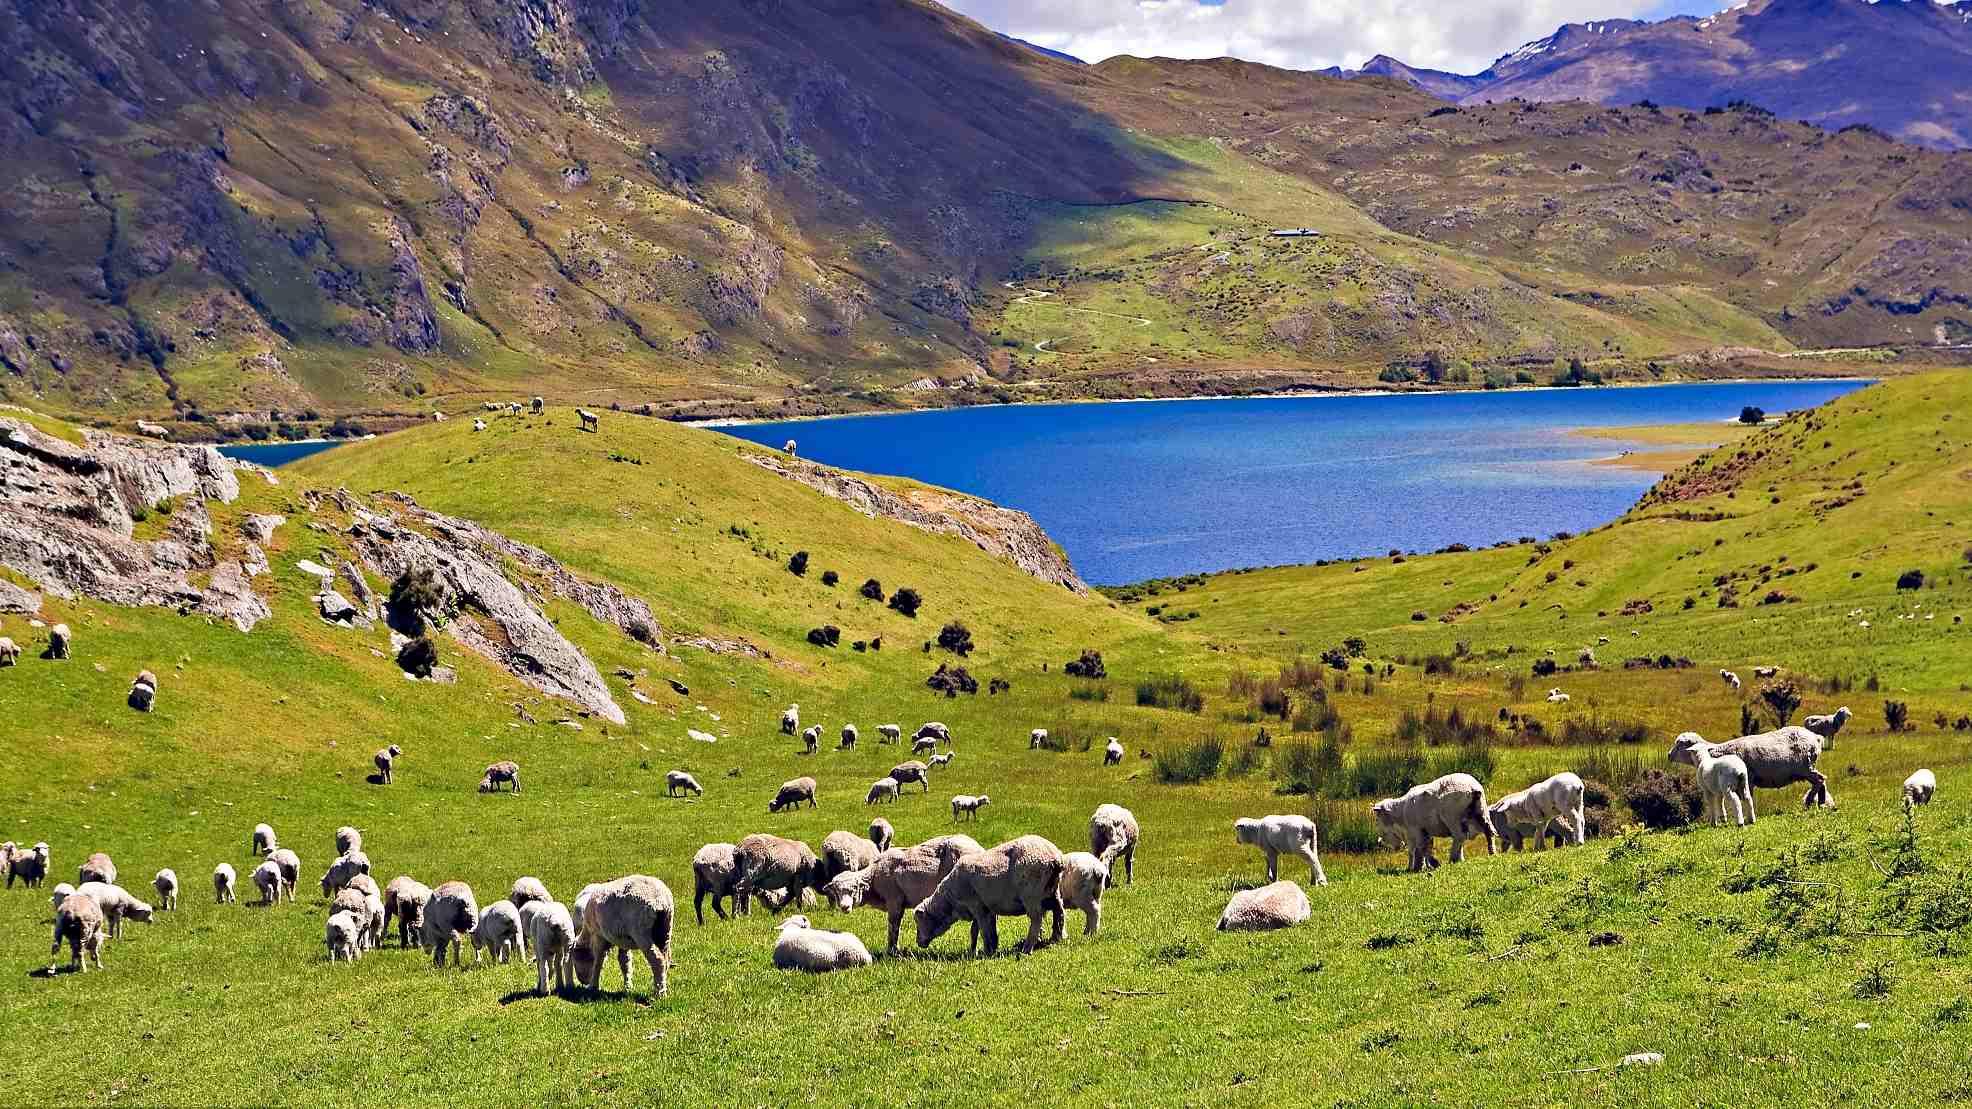 New Zealand slashes rates amid virus recession fears, market shrugs